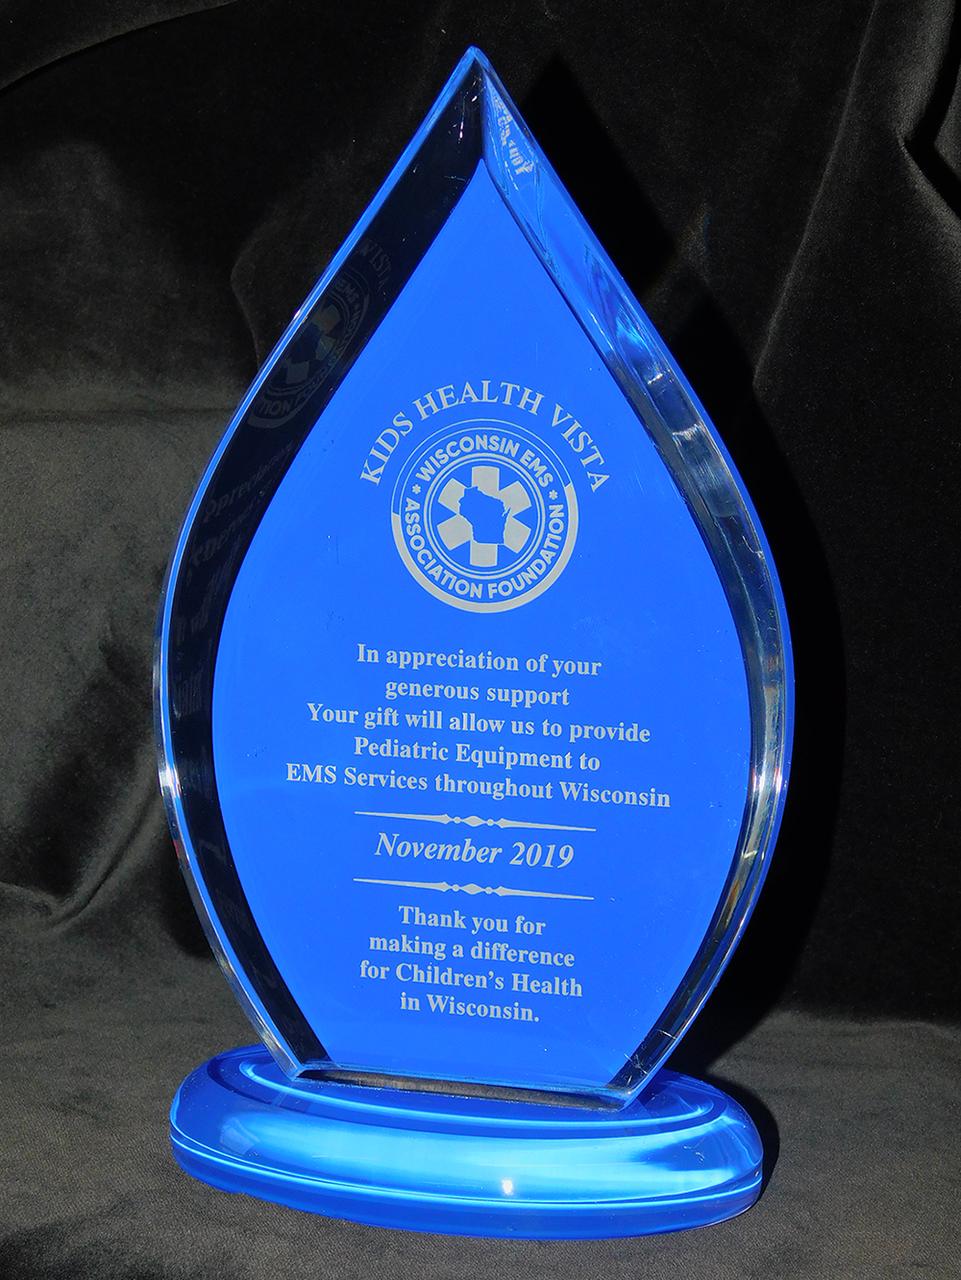 ACR-A685-FLM-BLU: Blue Flame Series Acrylic Award